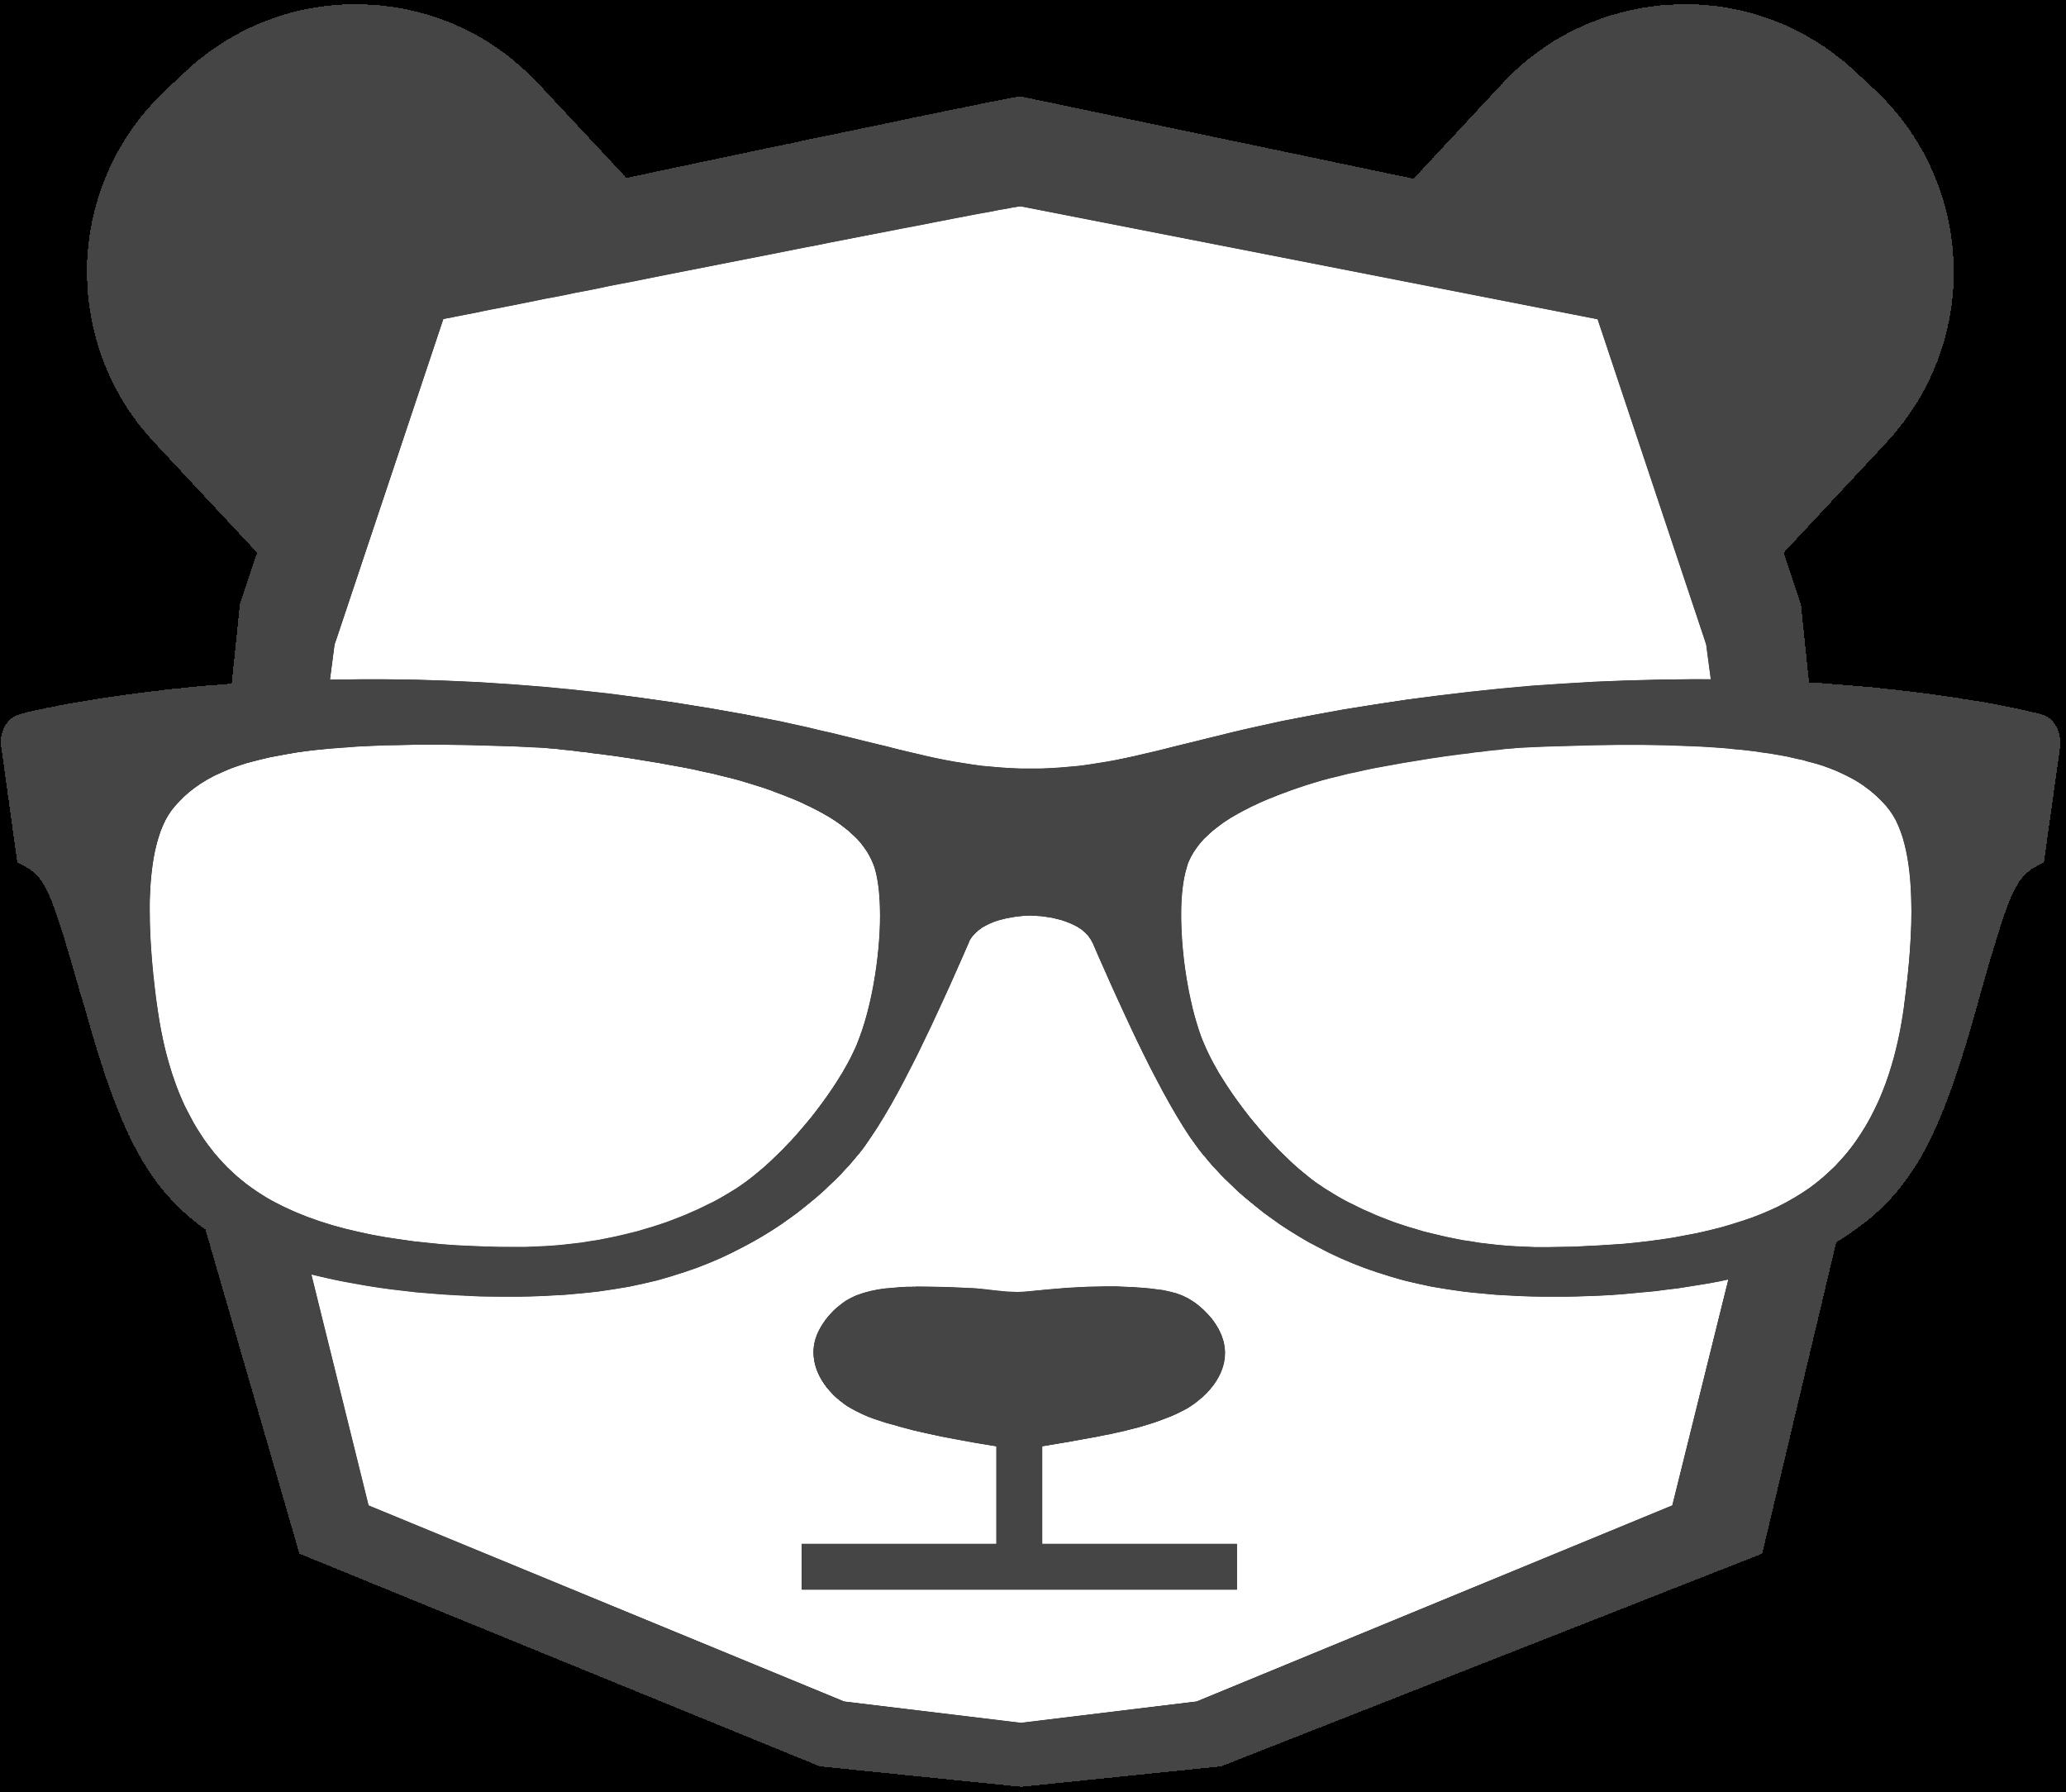 Logo von Big Panda